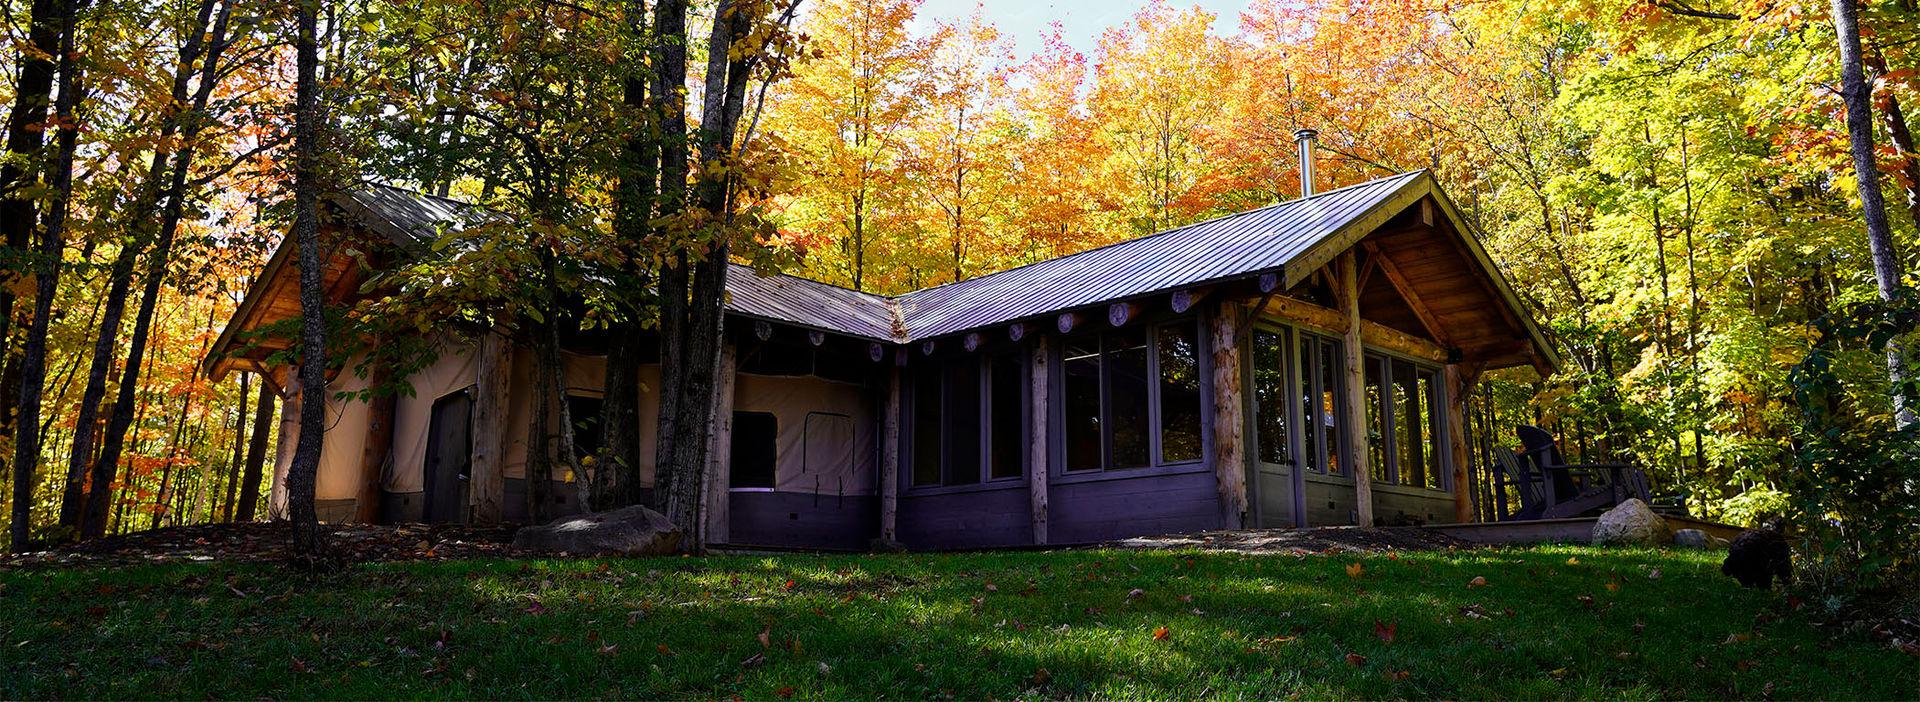 Woodfield lodge